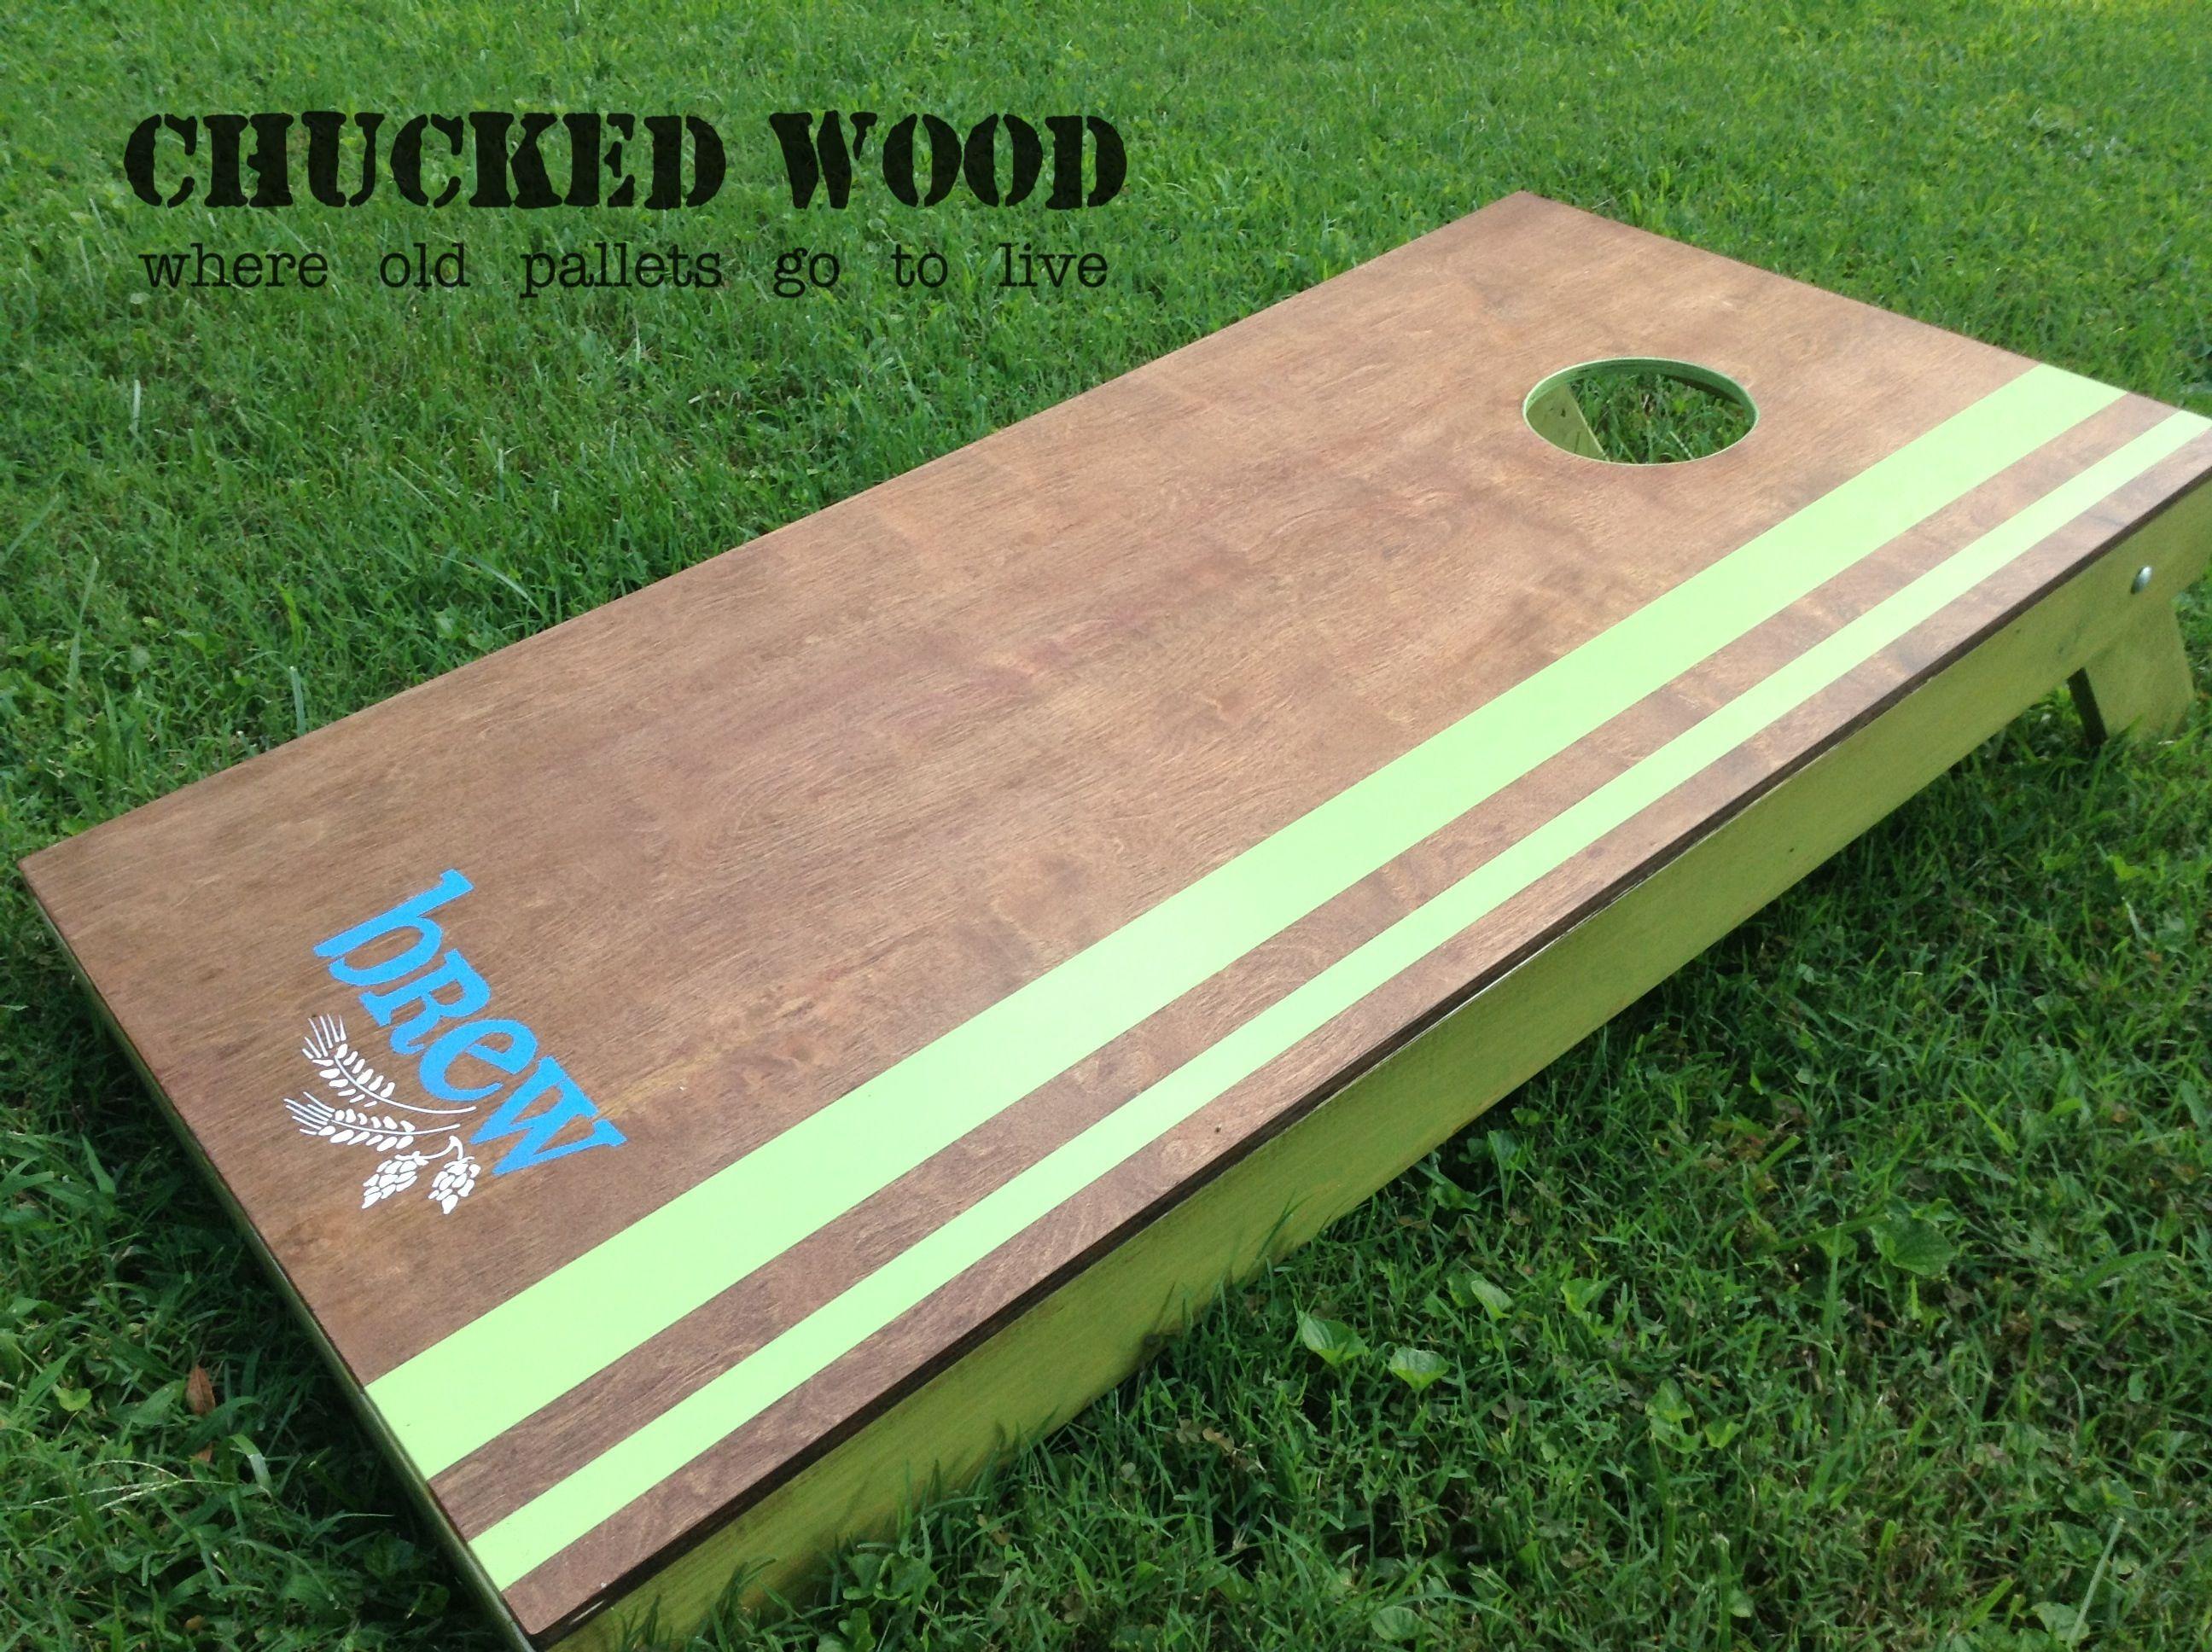 Cornhole Board Pallet Wood Slats Chucked